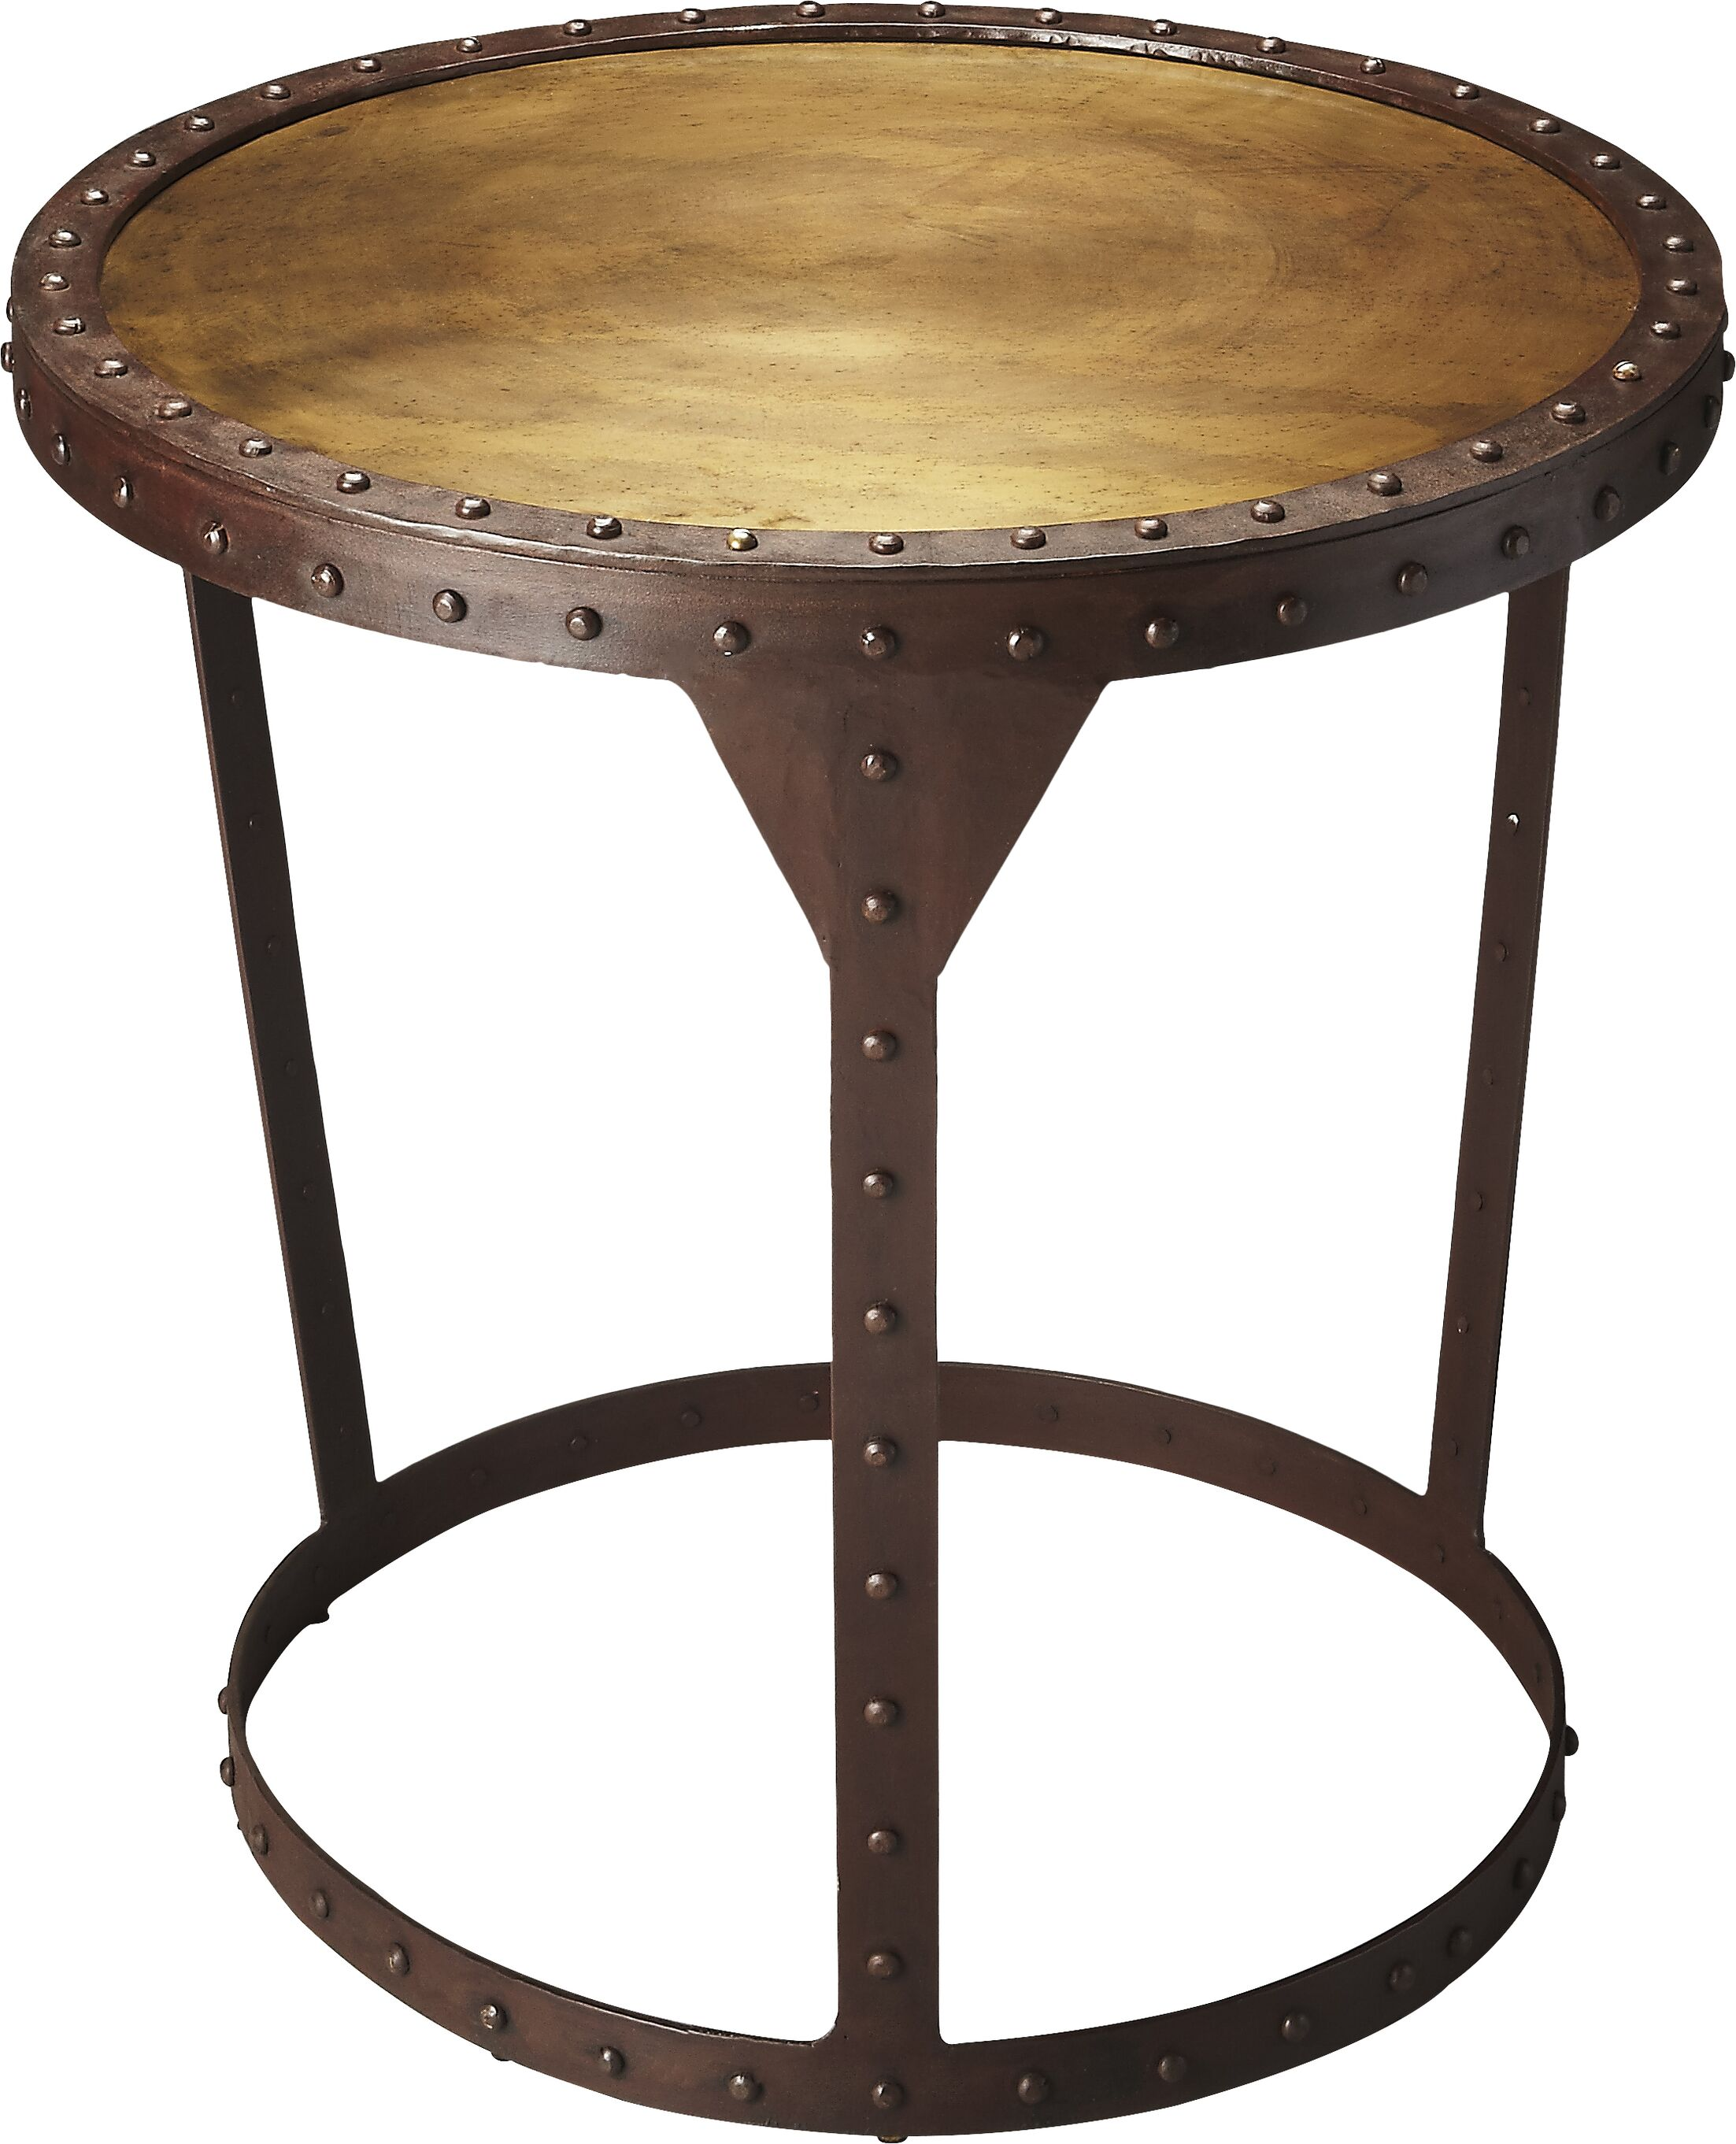 Wyrick End Table